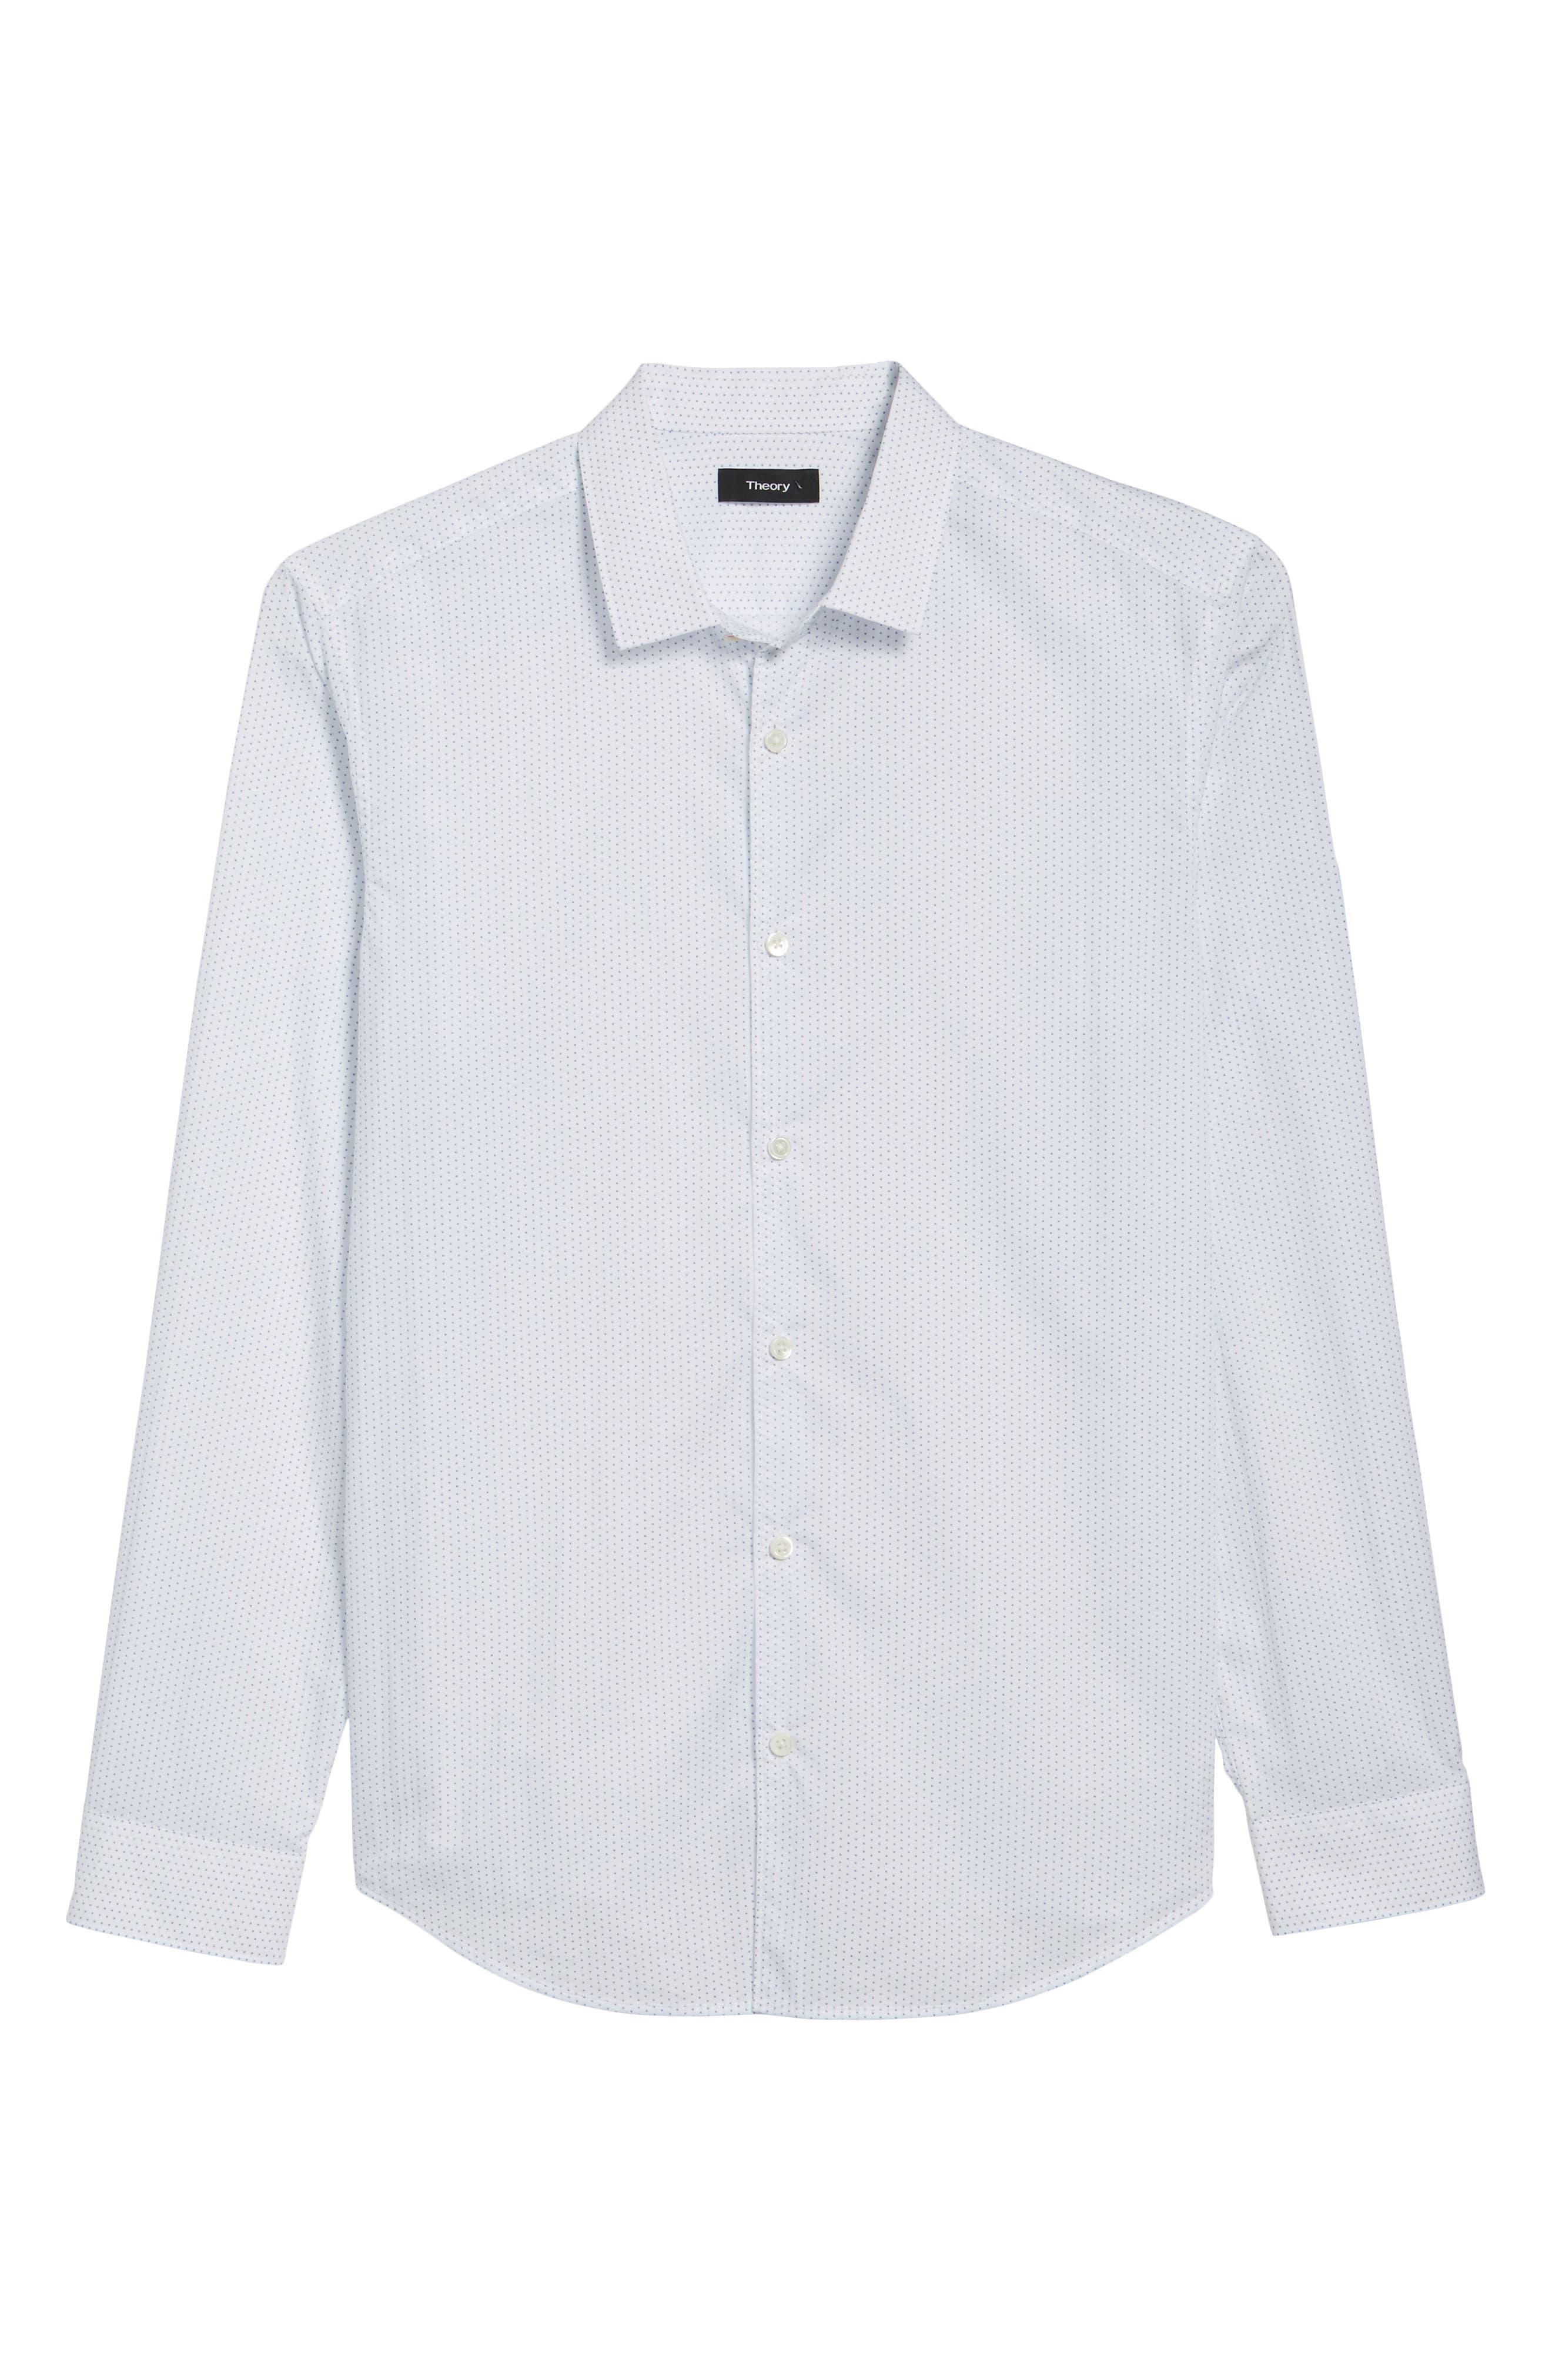 Murray Slim Fit Sport Shirt,                             Alternate thumbnail 6, color,                             100